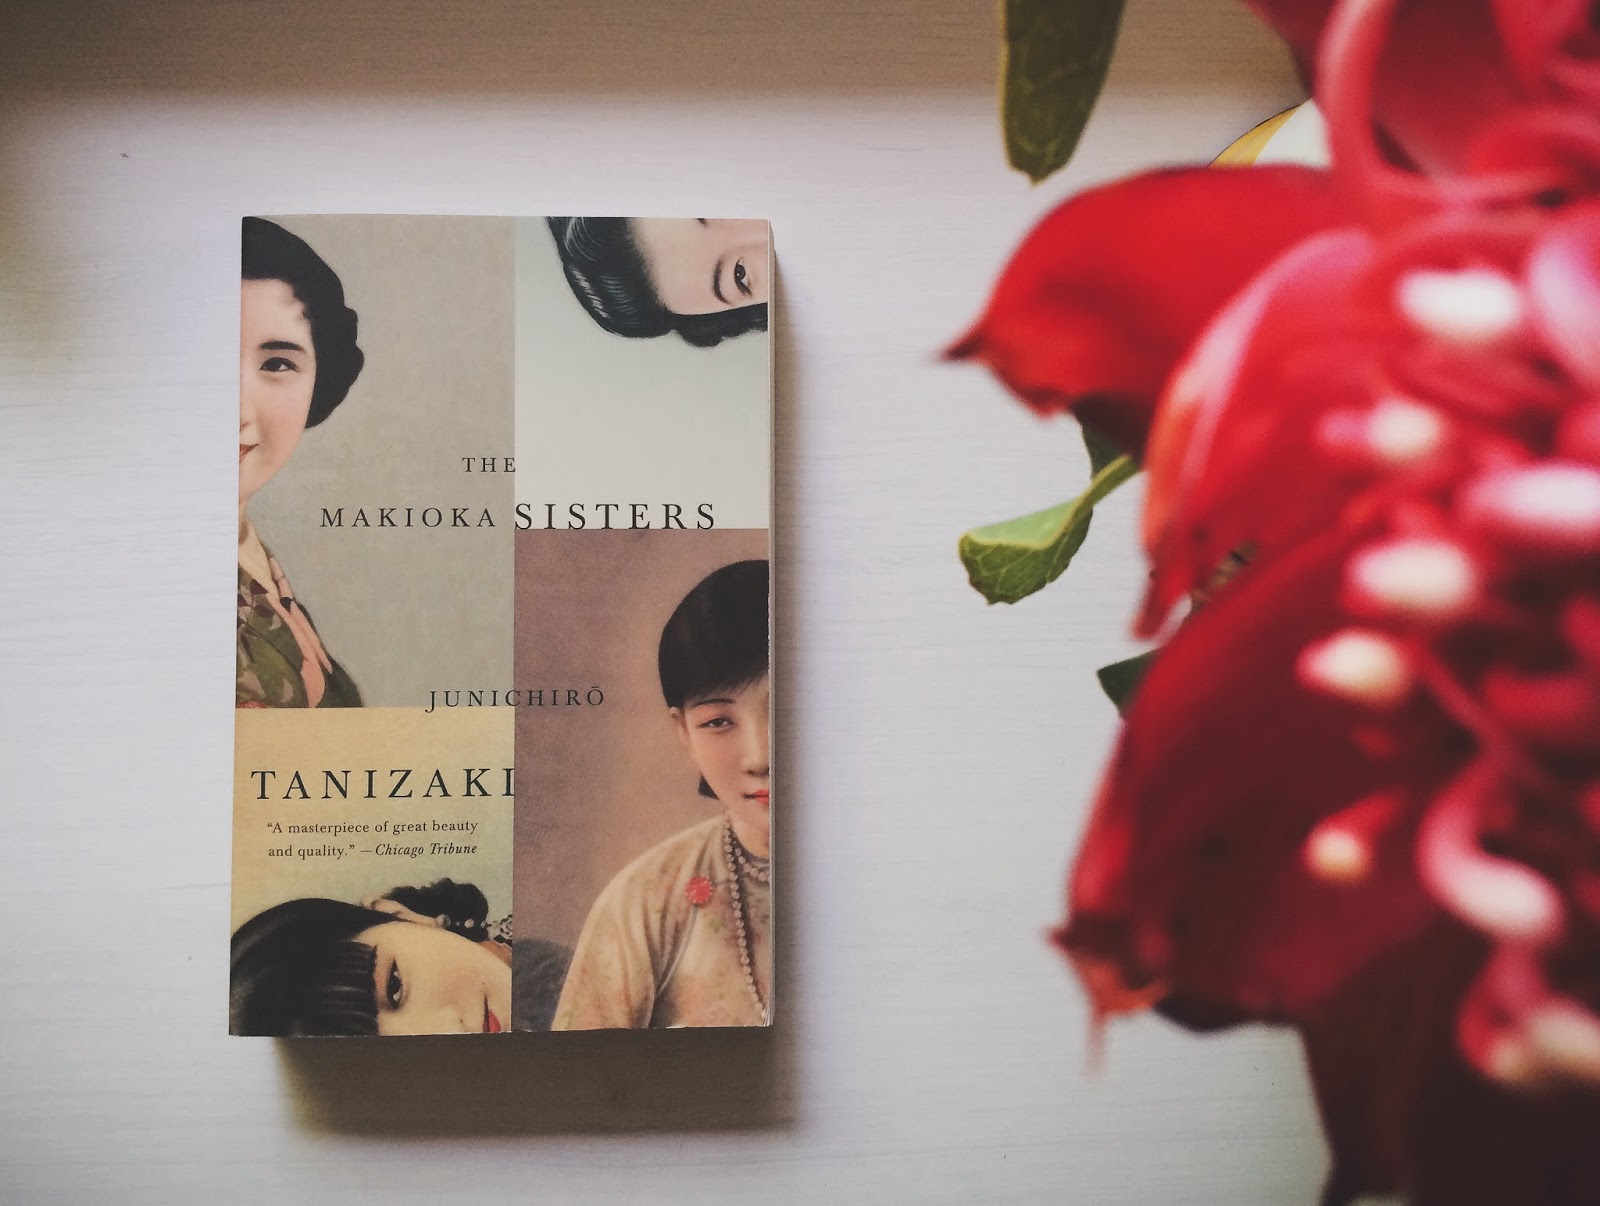 The Makioka Sisters Tanizaki Junichiro, Japanese Literature, Books, Book Haul